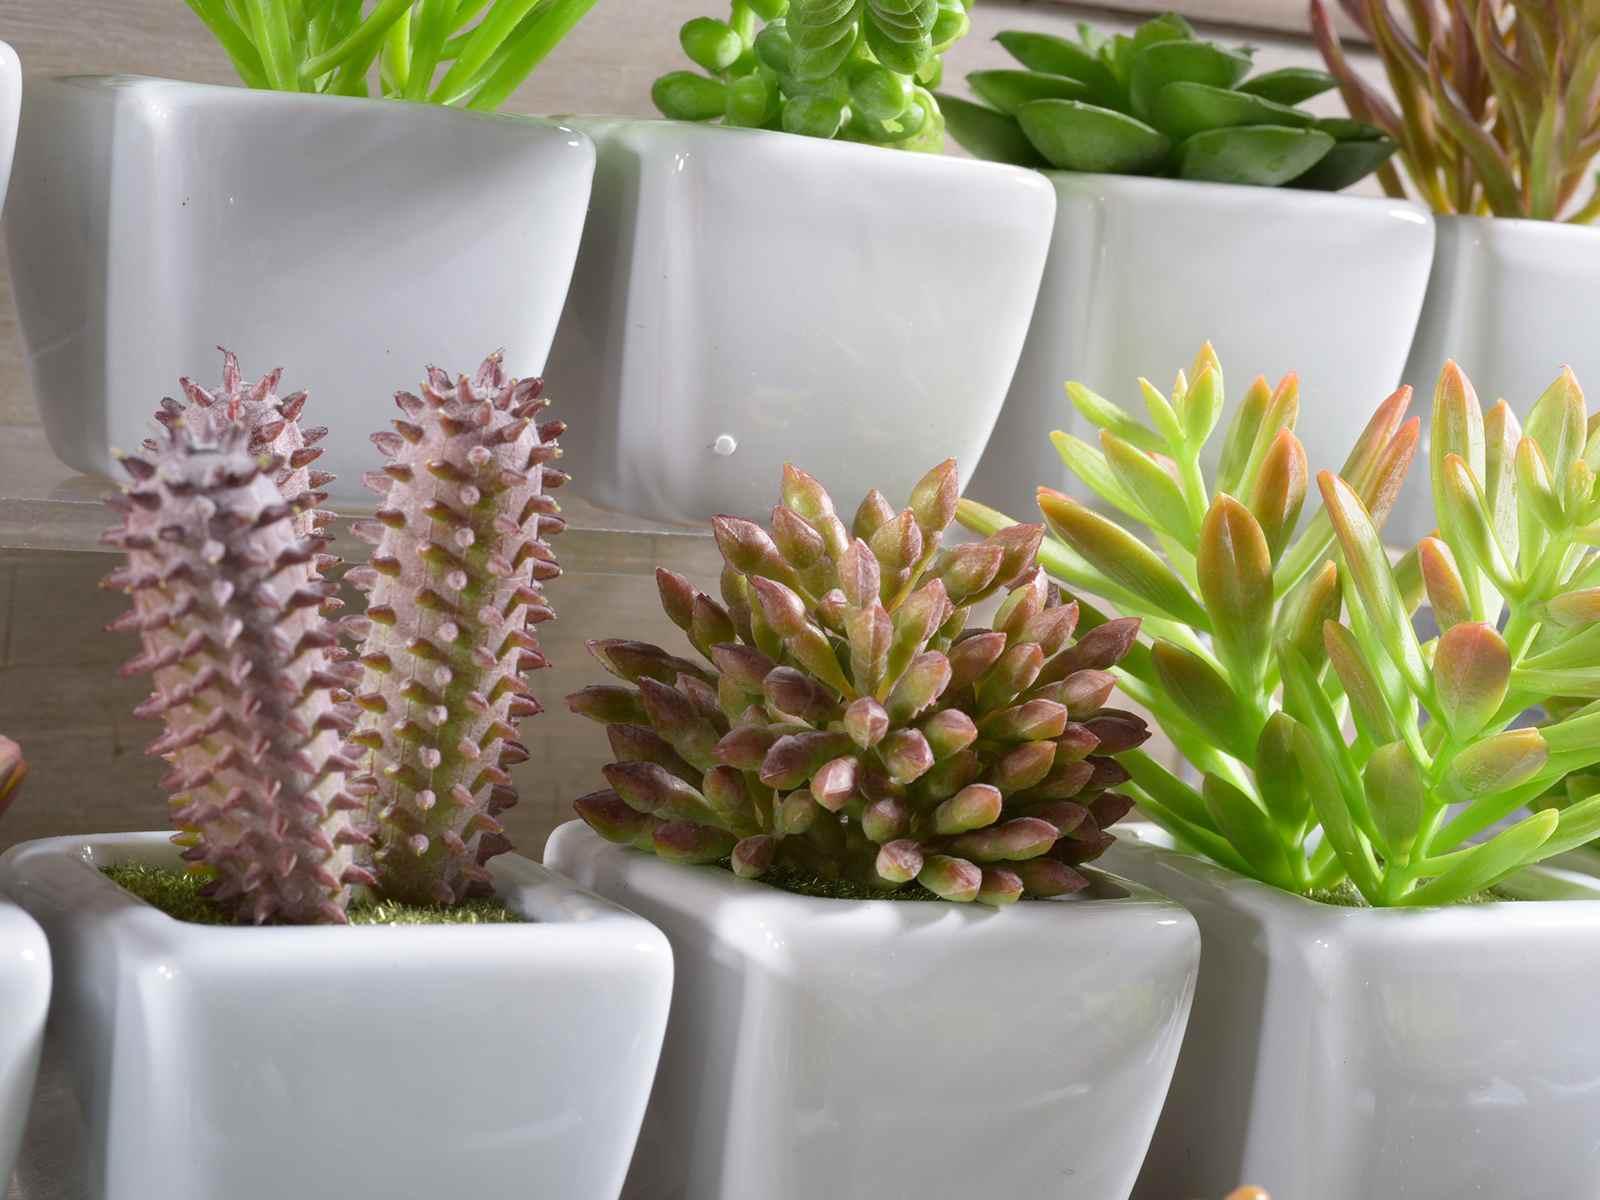 Afi eaz plante decorative suculente n ghiveci Plante decorative